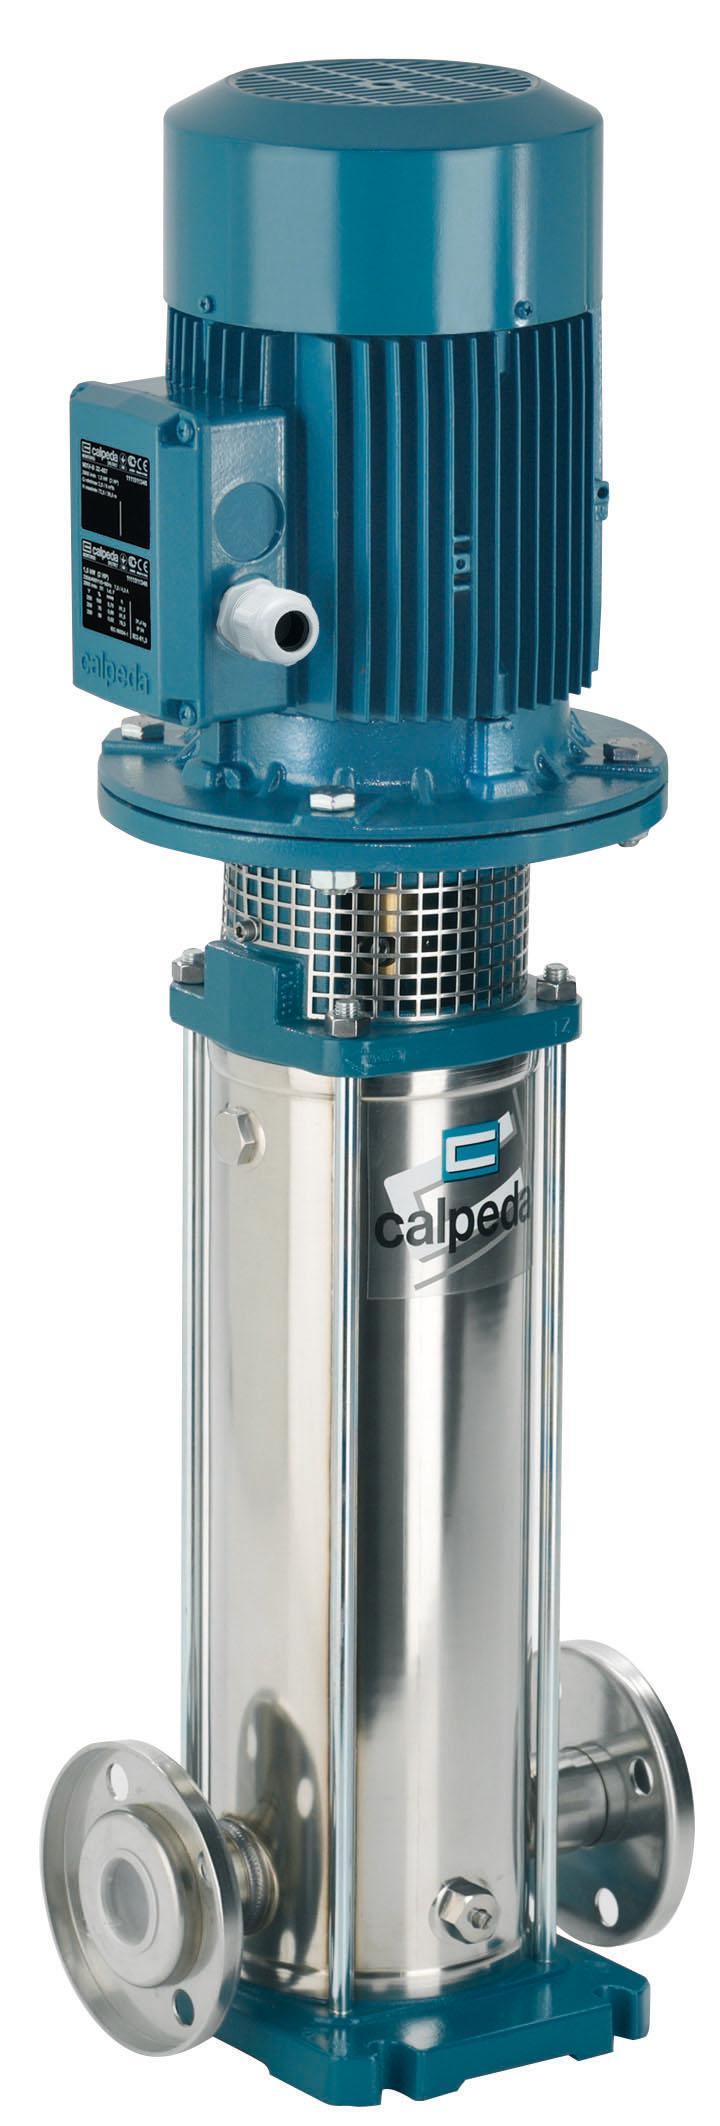 Насос Calpeda Mxv 32-410/c 230/400/50 hz m90 v1-2.2t